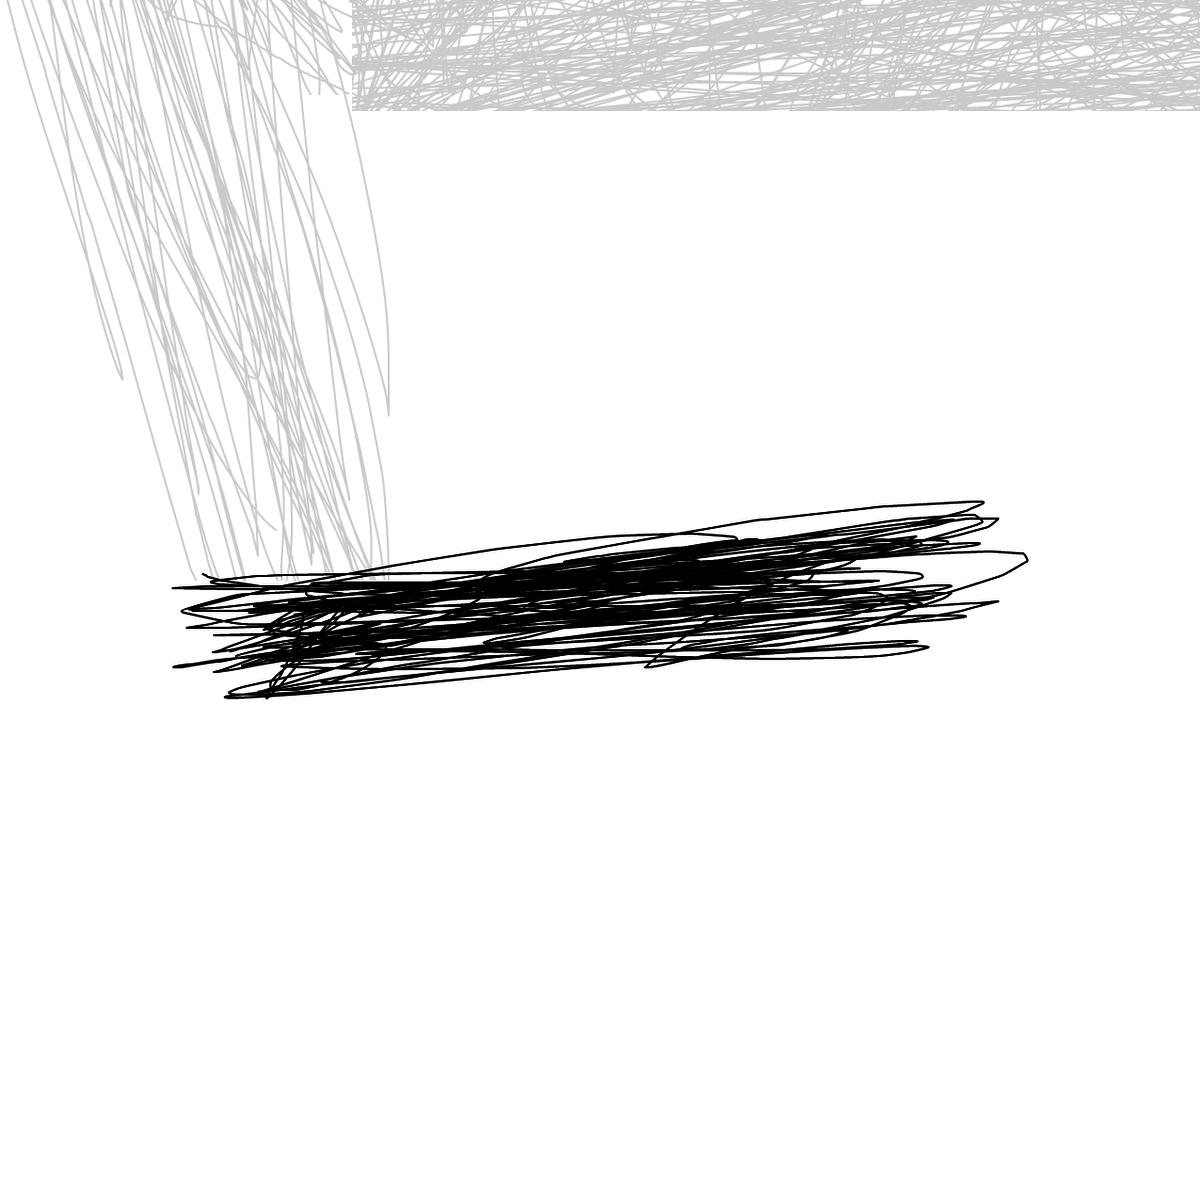 BAAAM drawing#19201 lat:60.3897857666015600lng: 25.6665077209472660